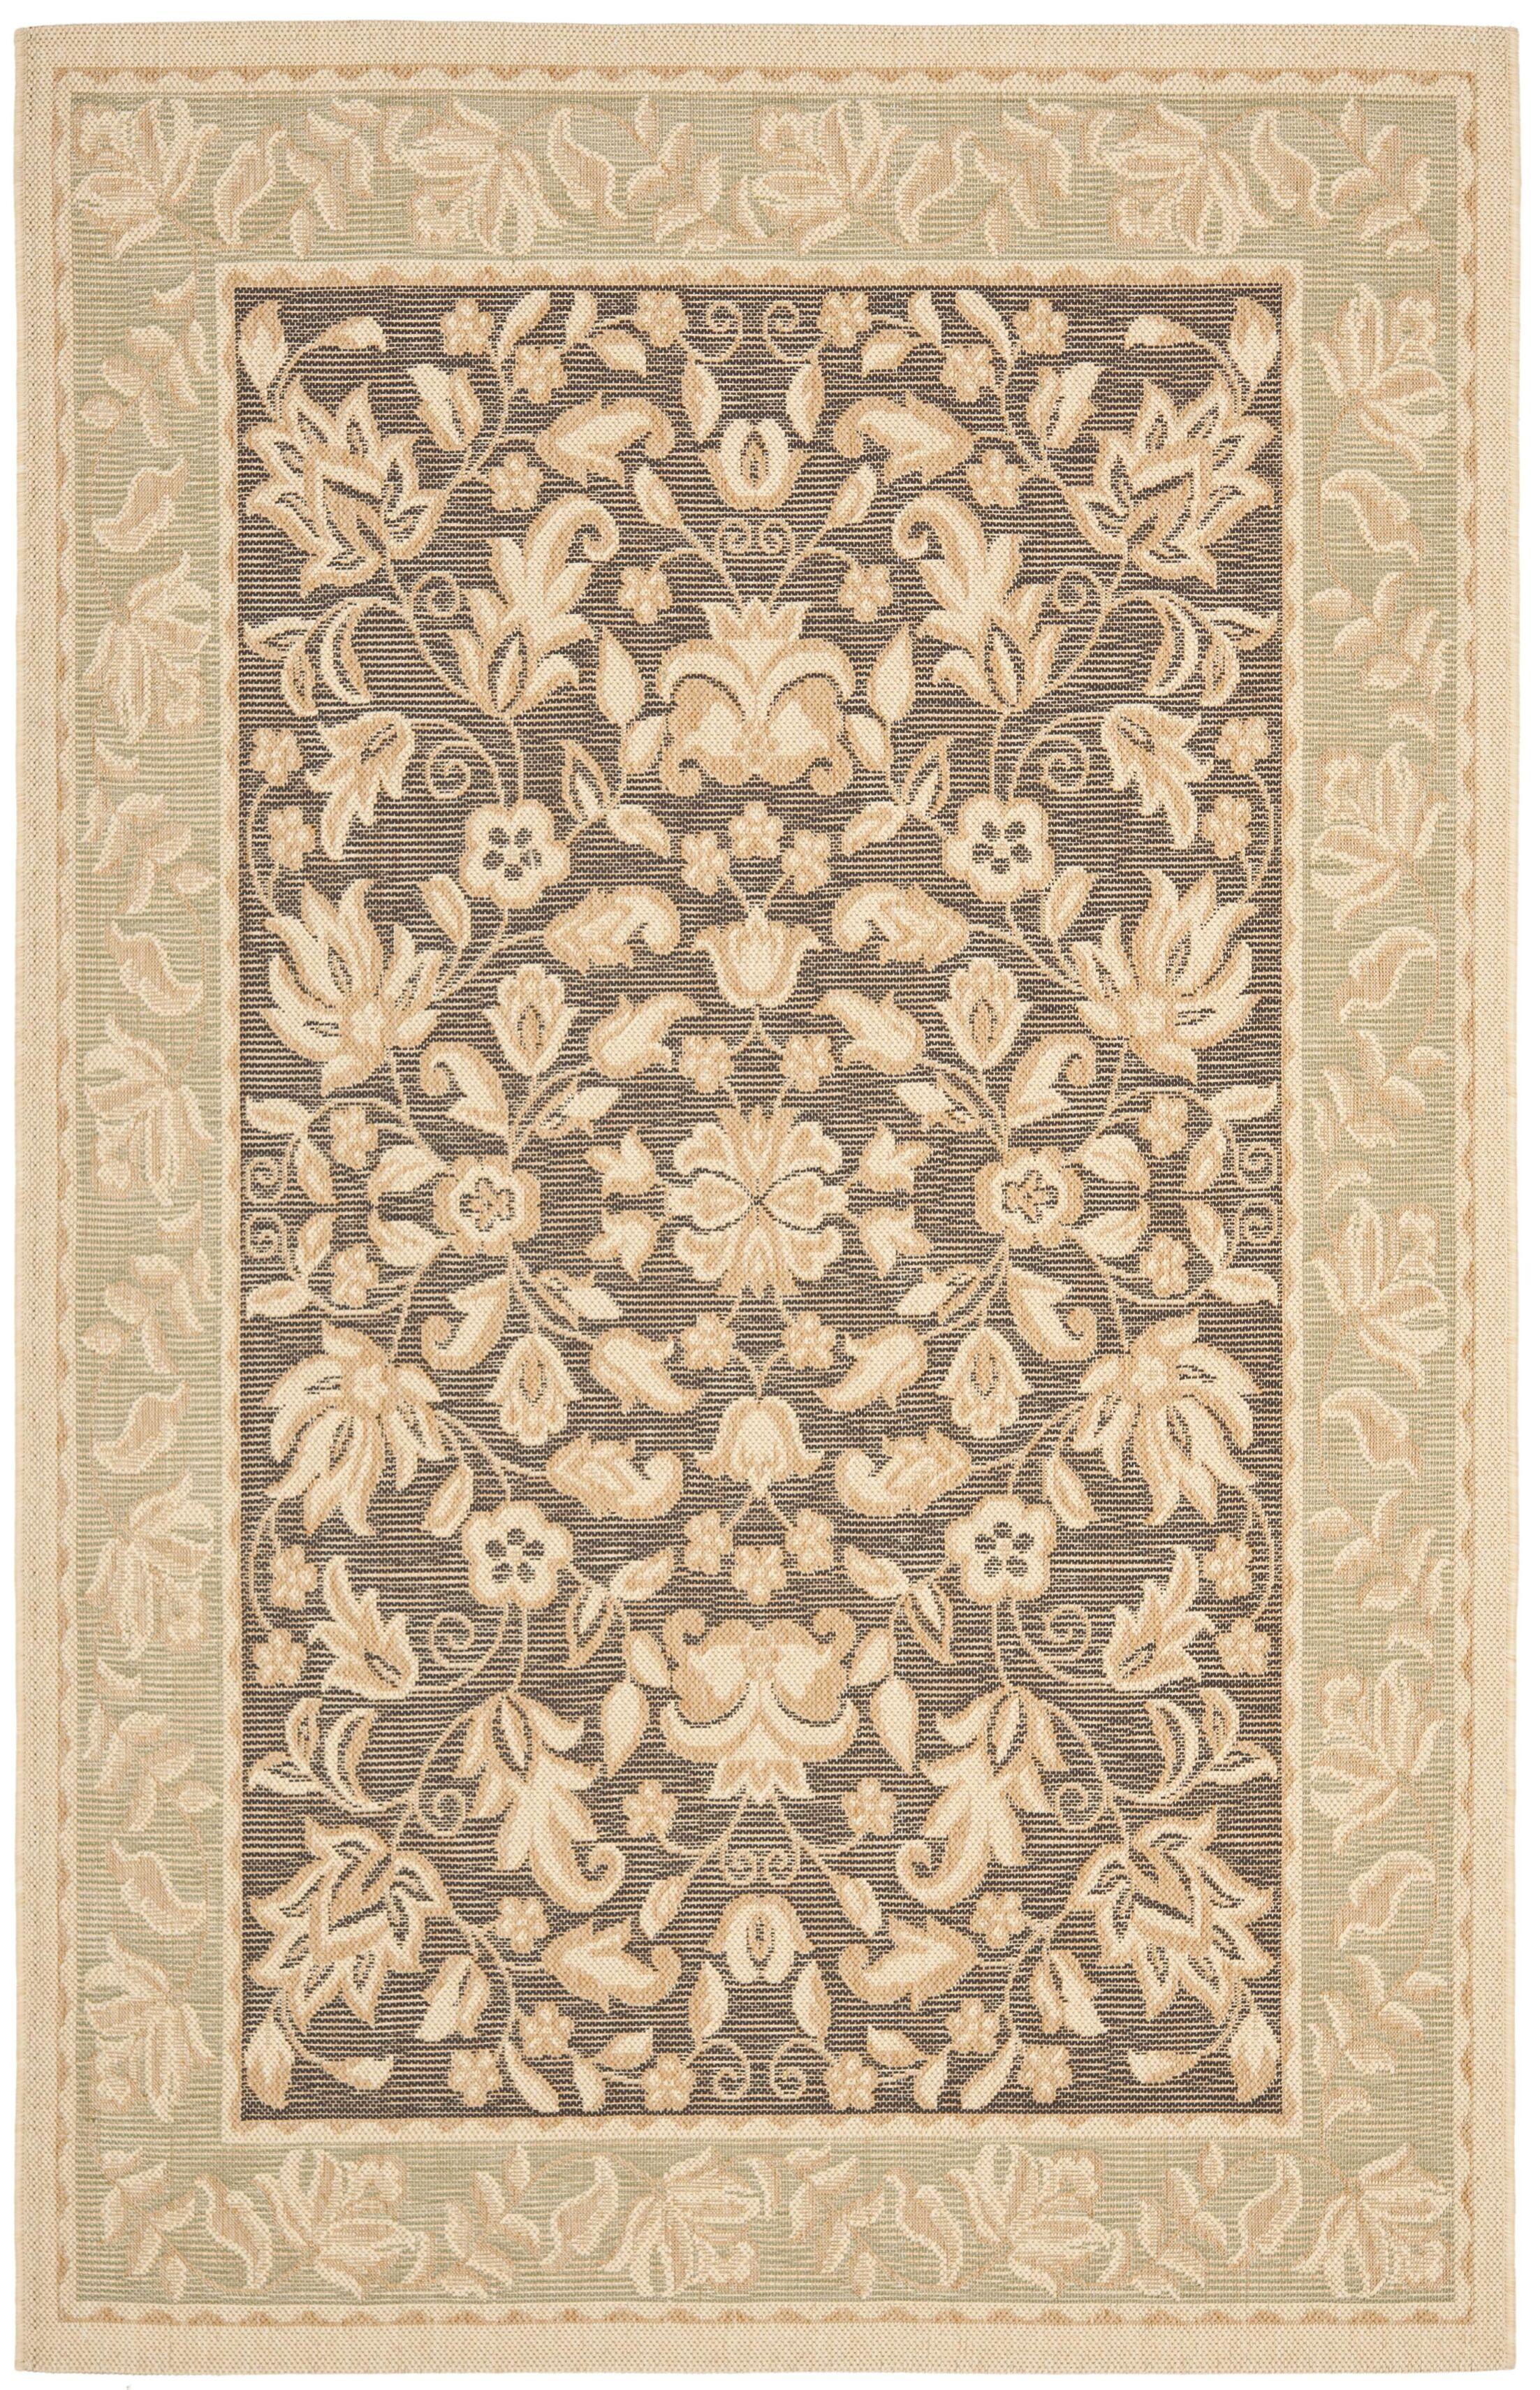 Raabe Dark Brown/Tan Indoor/Outdoor Area Rug Rug Size: Rectangle 5'3